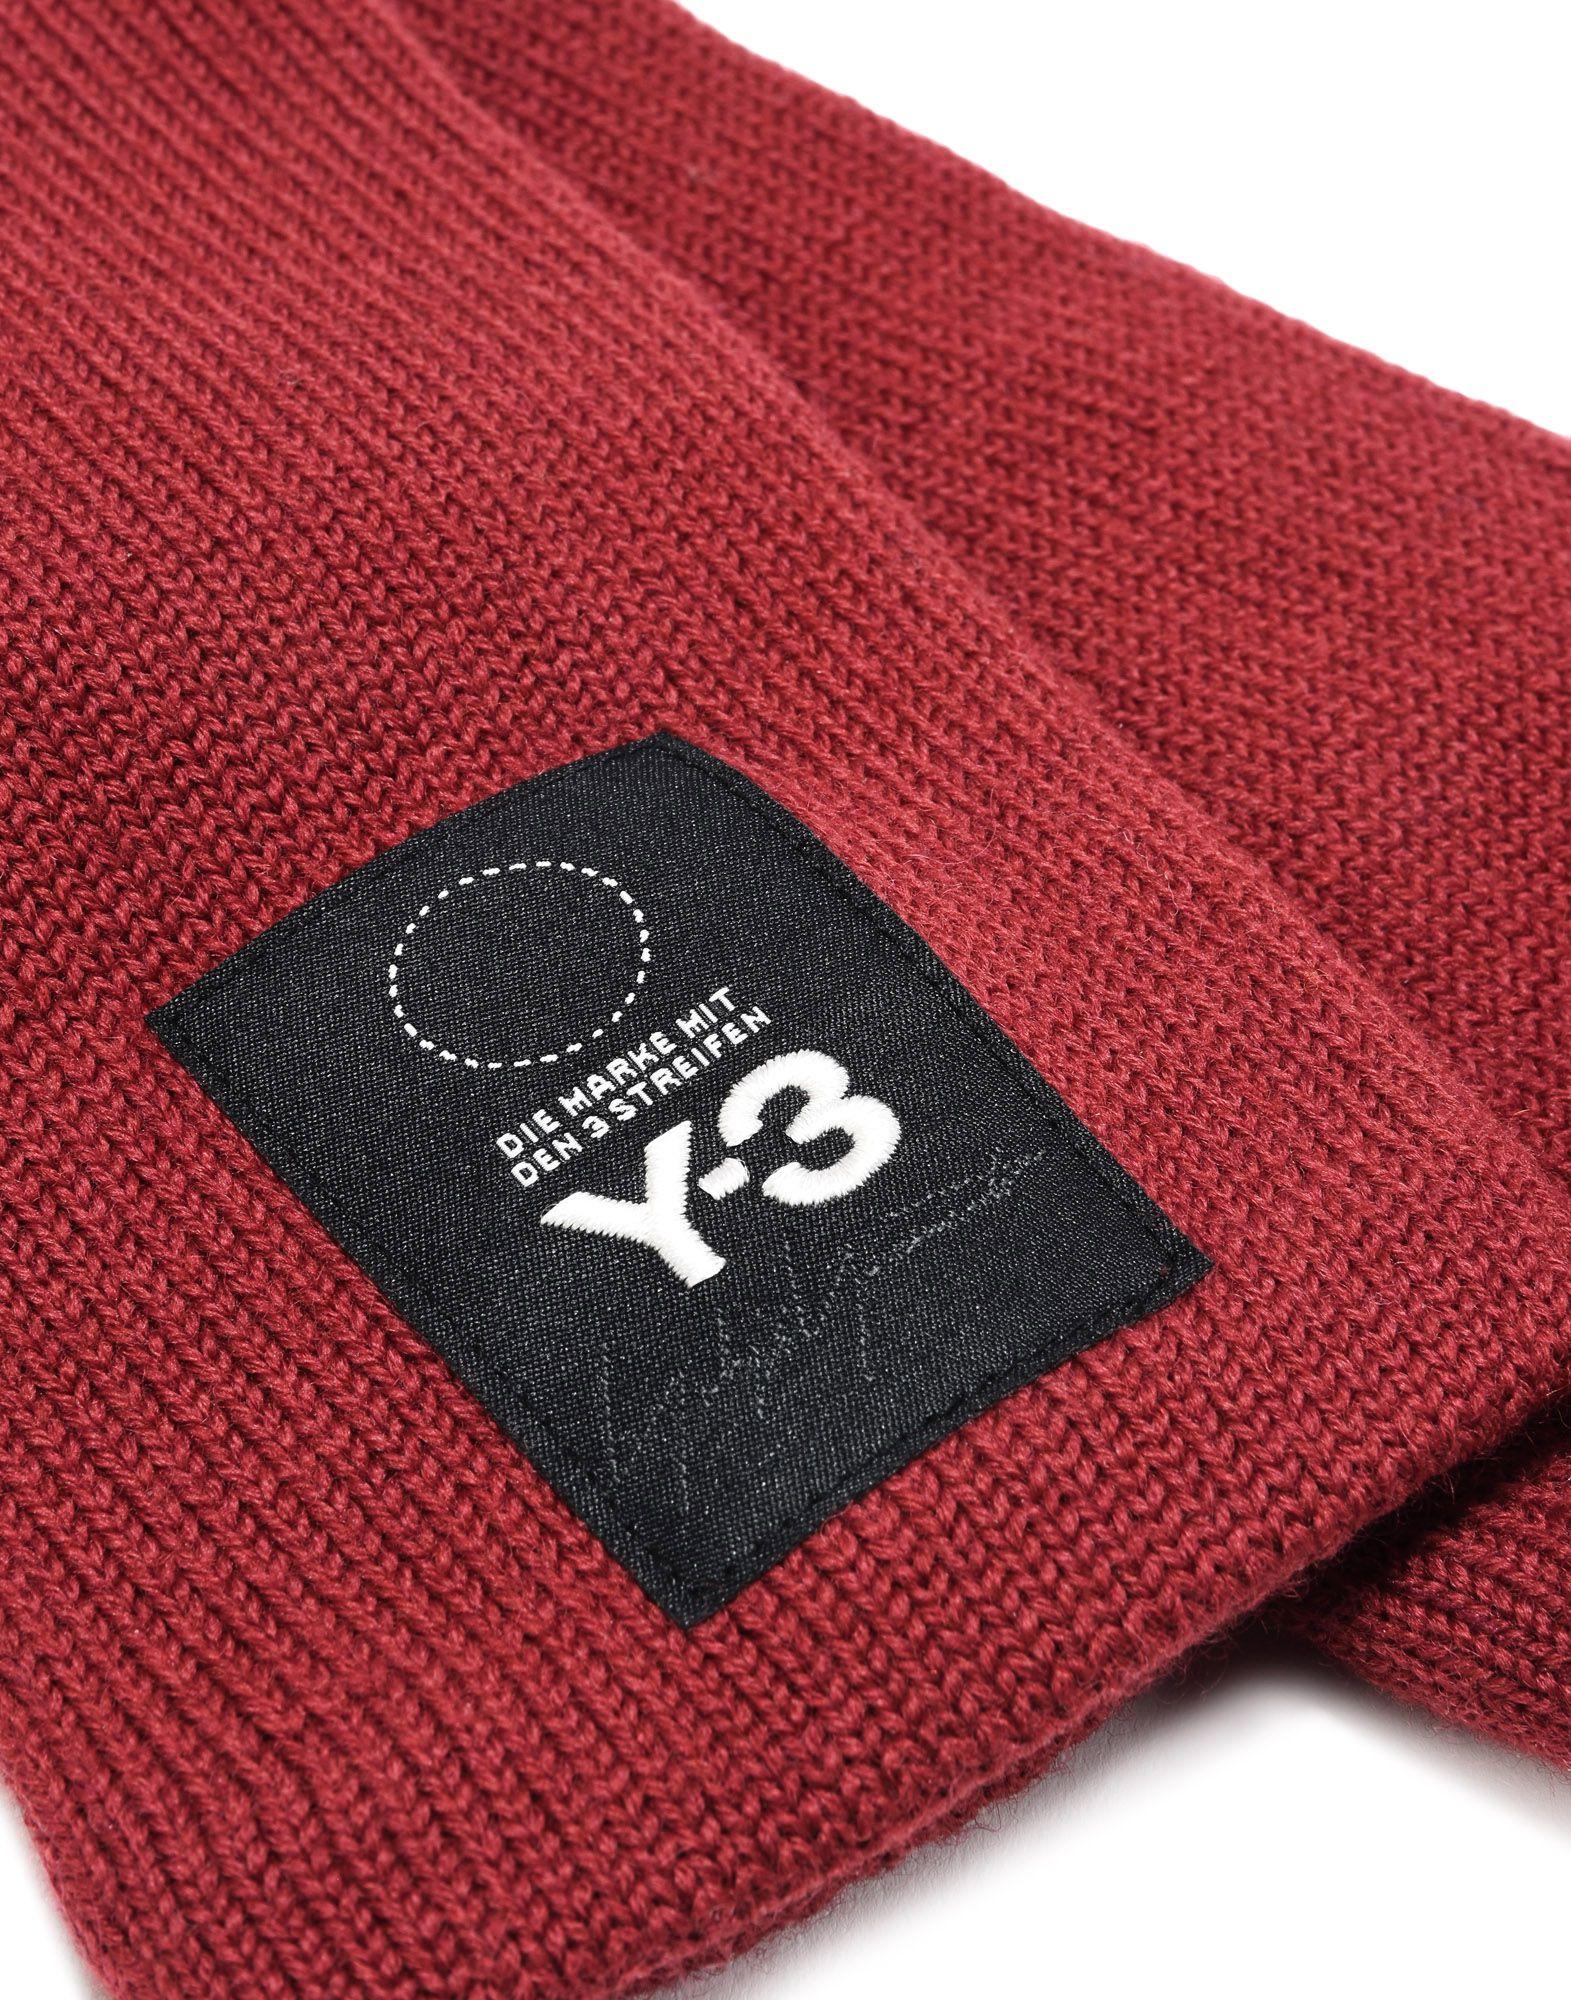 Logo y 3 guanti ruggine per donne adidas y 3 negozio ufficiale